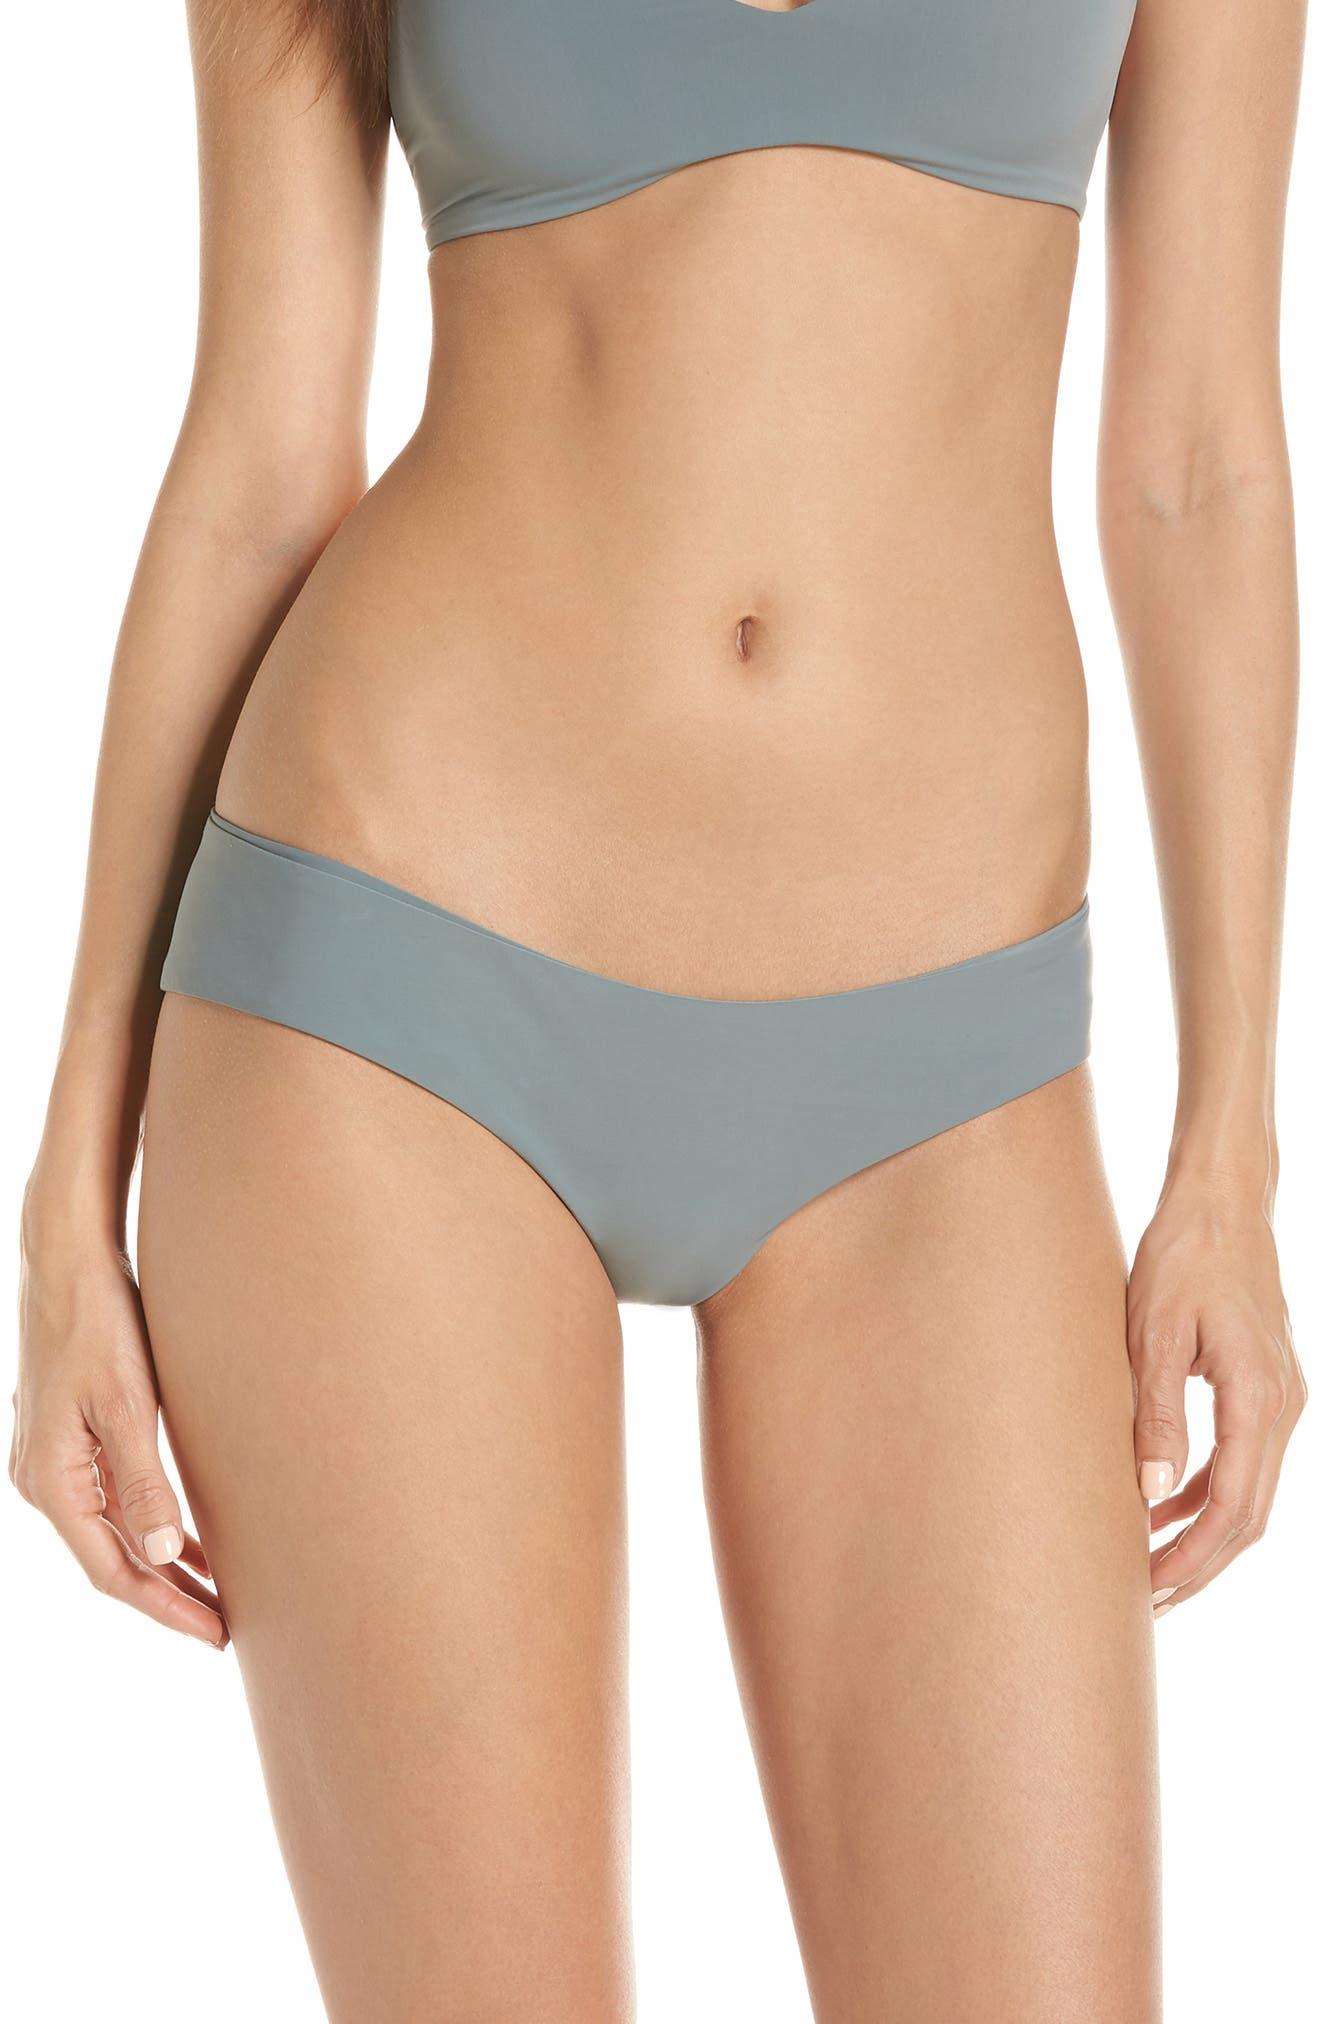 Boys + Arrows Yaya The Yuppy Bikini Bottoms, Grey